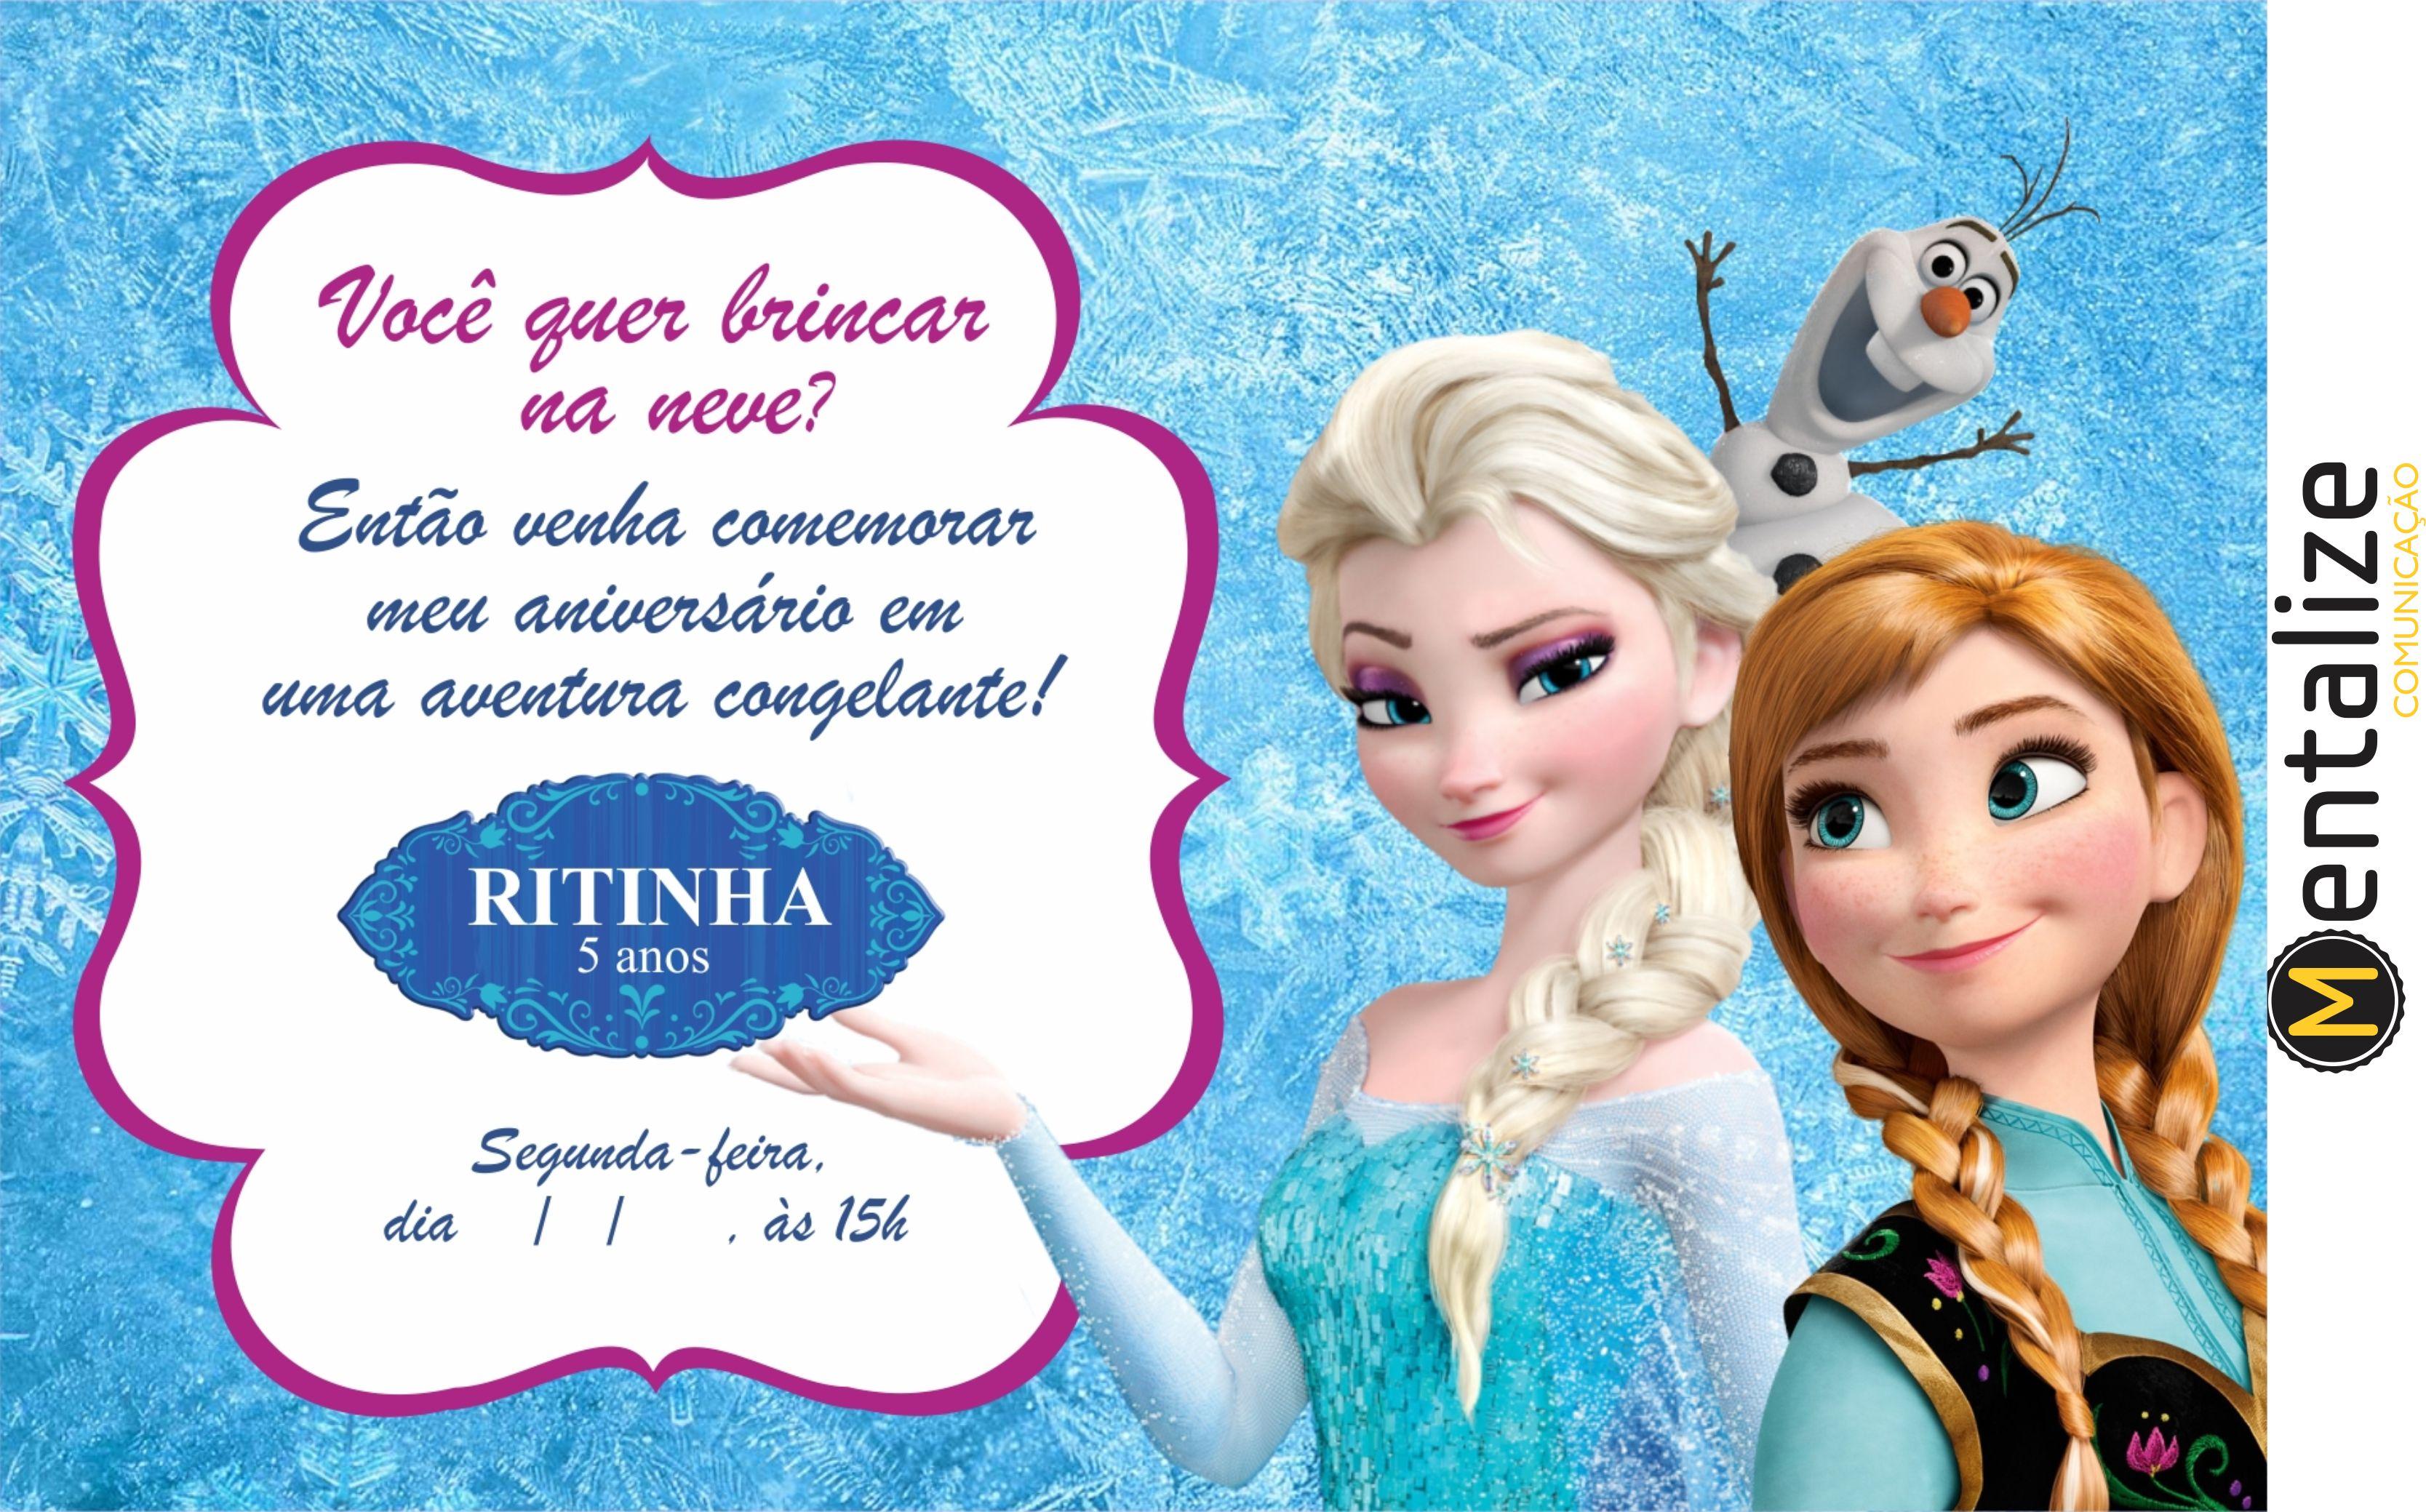 convite frozen no elo7 ruany bento 4f7a84